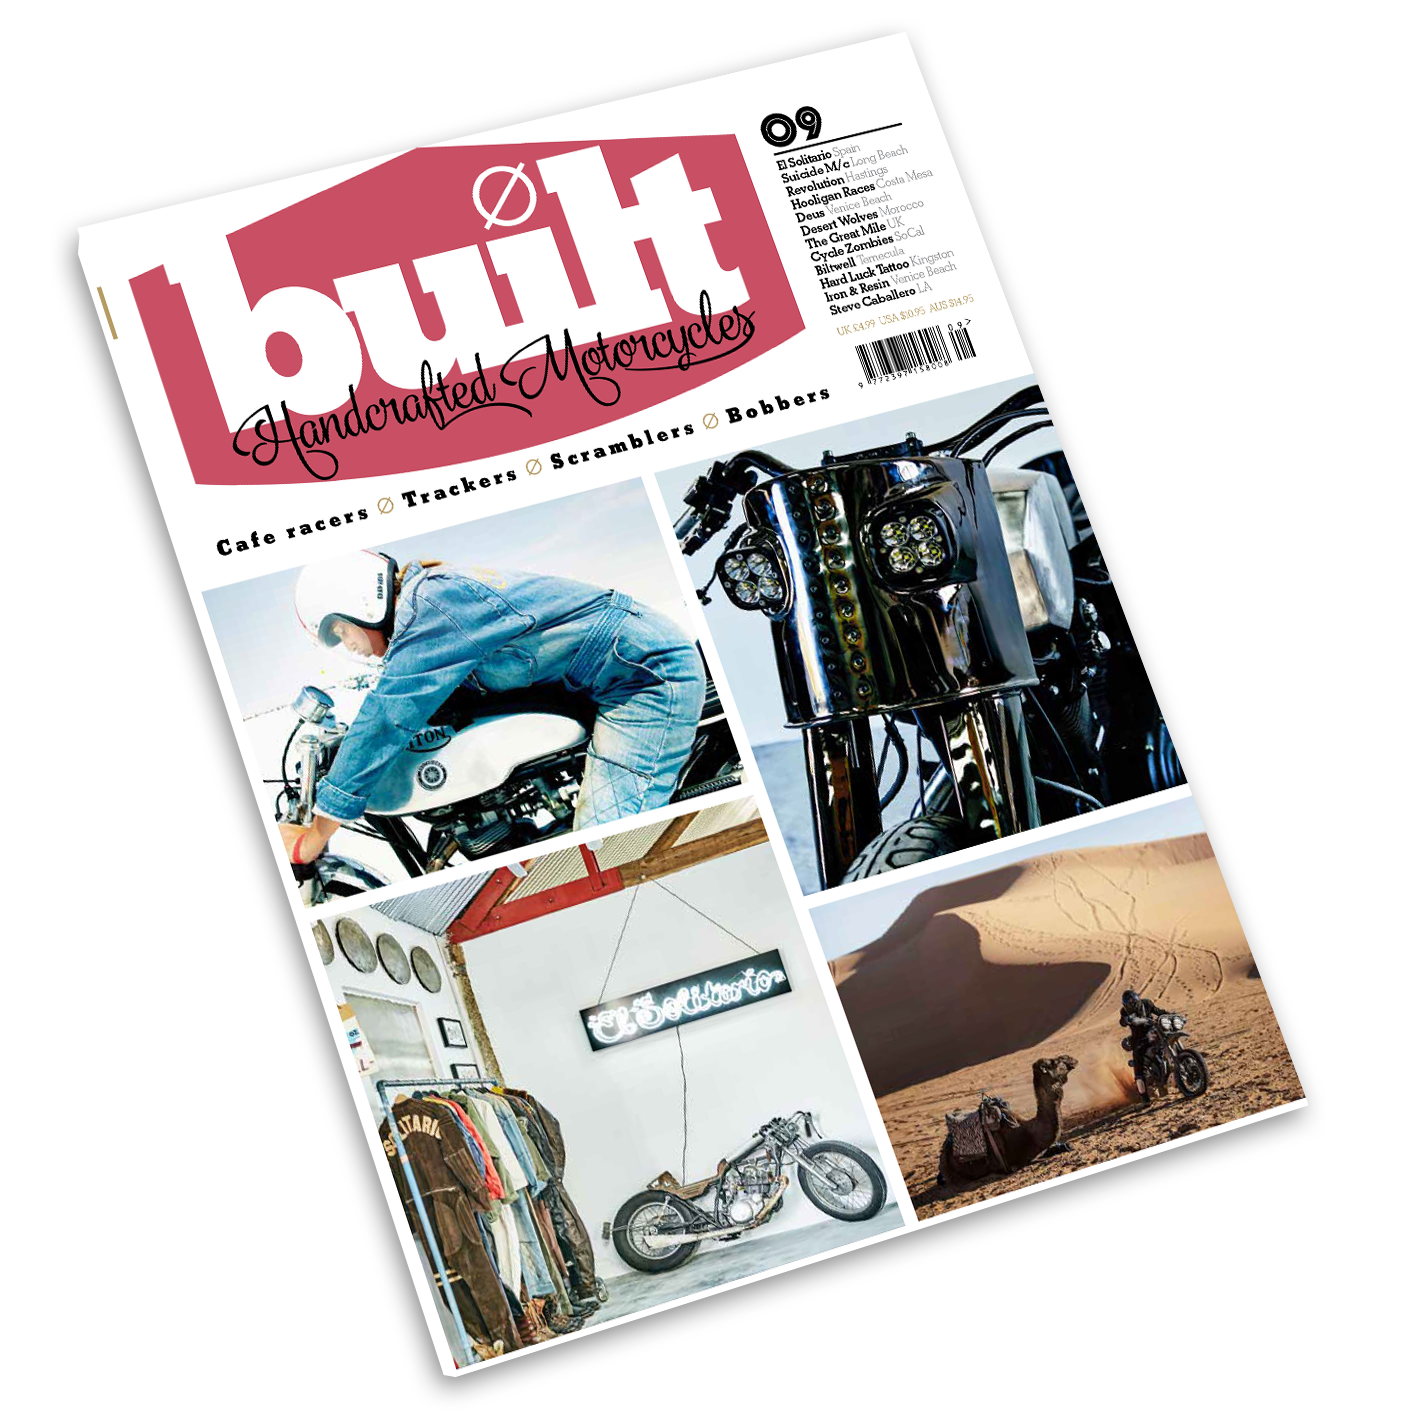 Built magazine issue 9